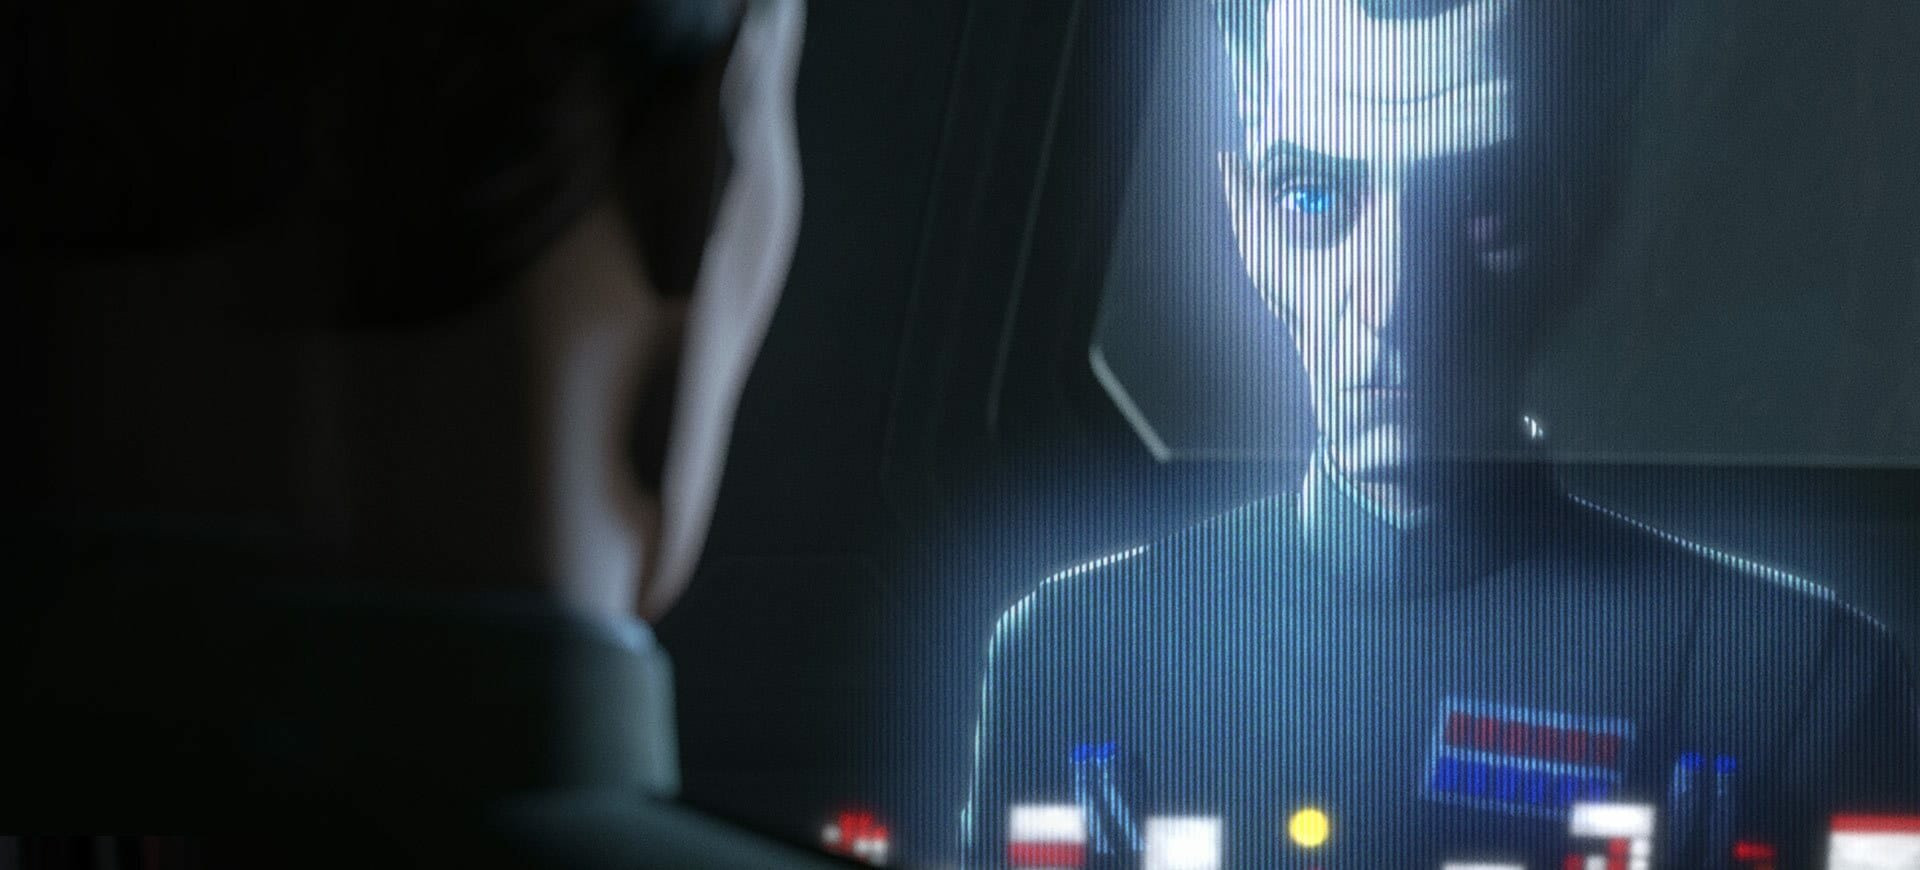 Star Wars: The Bad Batch — s01e15 — Return to Kamino